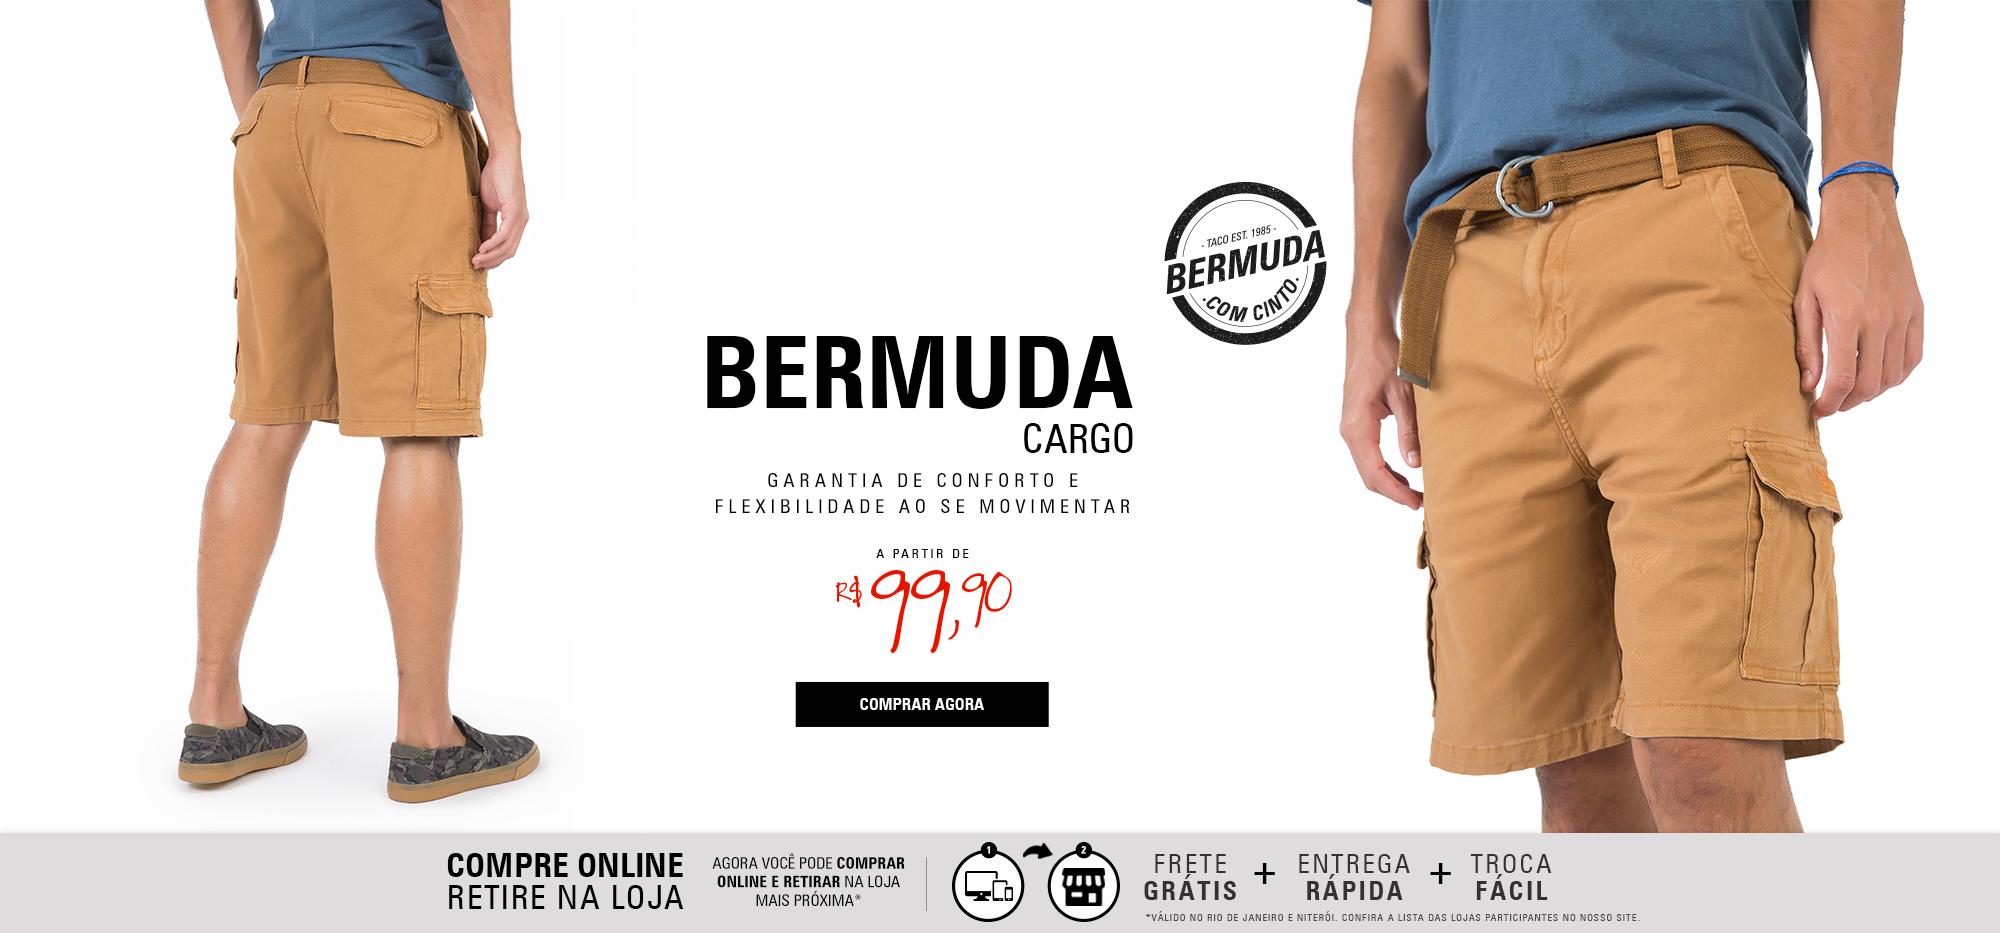 BERMUDA CARGO - ESCURO